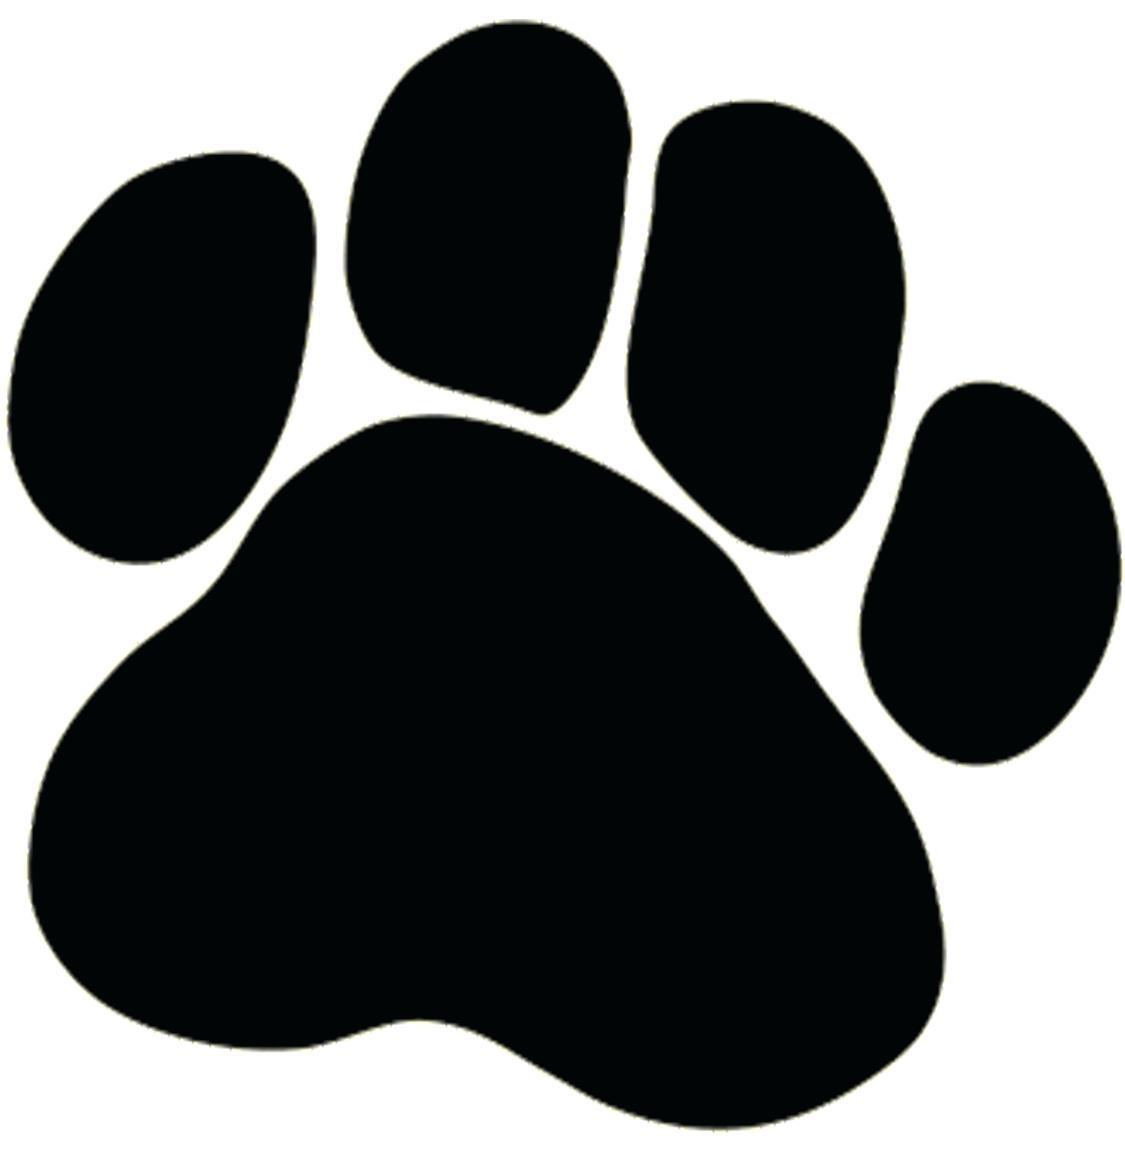 Bobcat clipart print. Printable paw prints dog